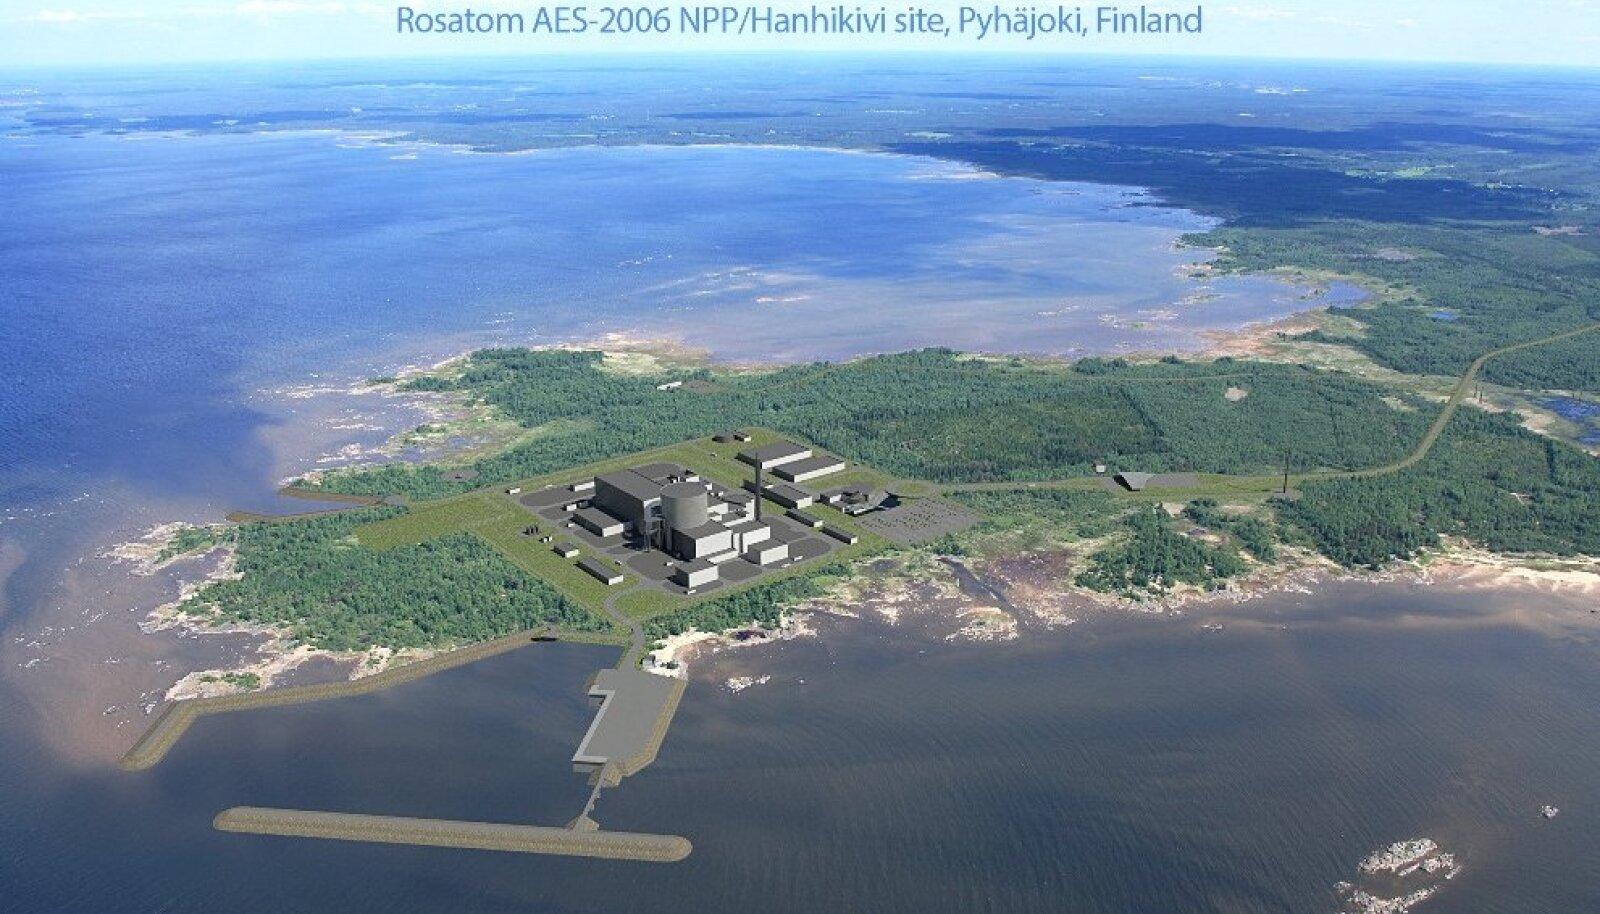 Hanhikivi 1 reaktori visand Fennovoimalt